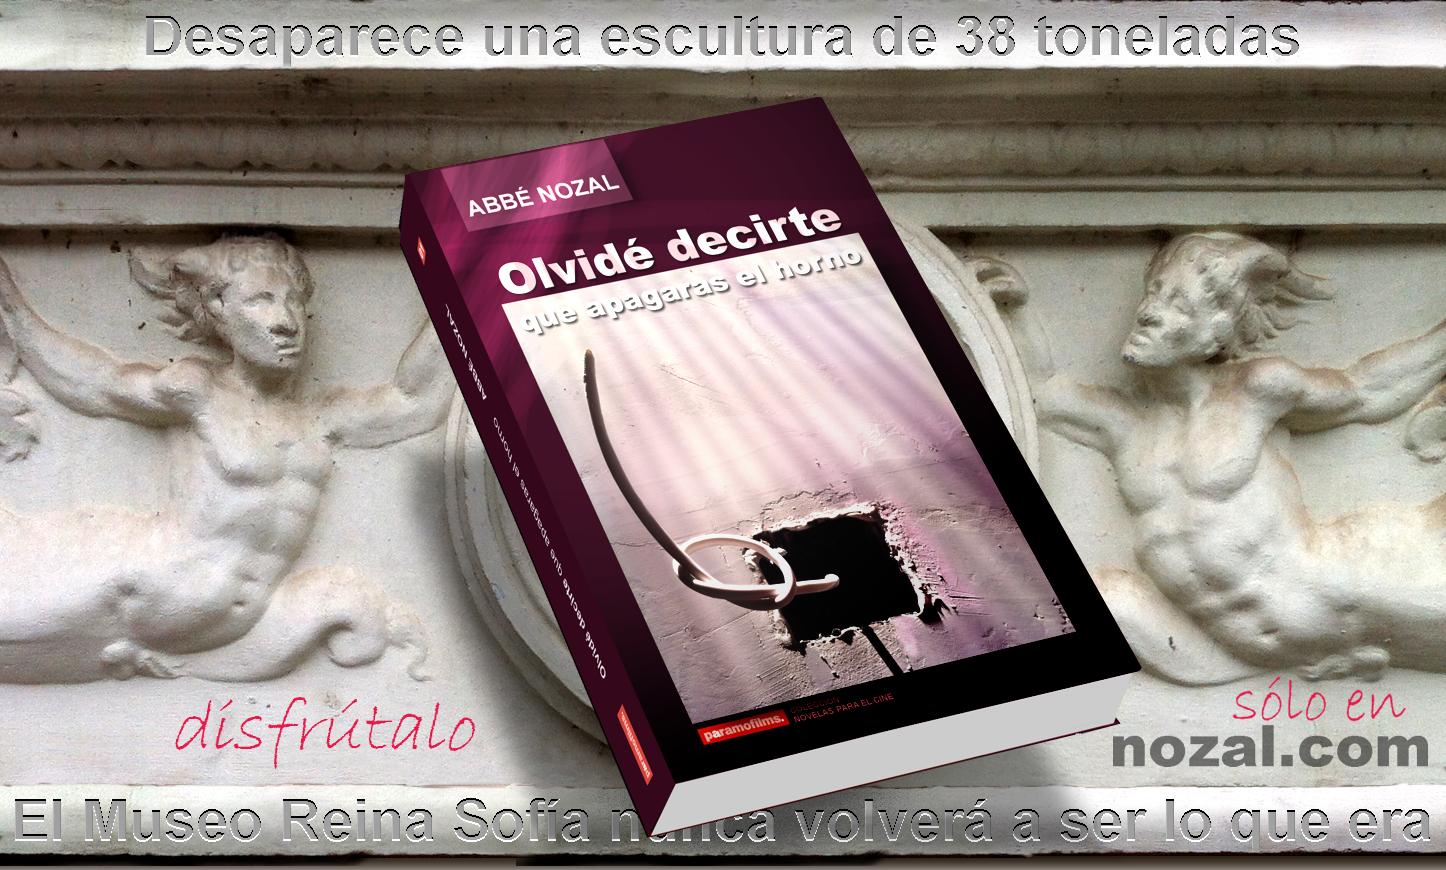 Bajorrelieve y novela, 2014 Abbé Nozal